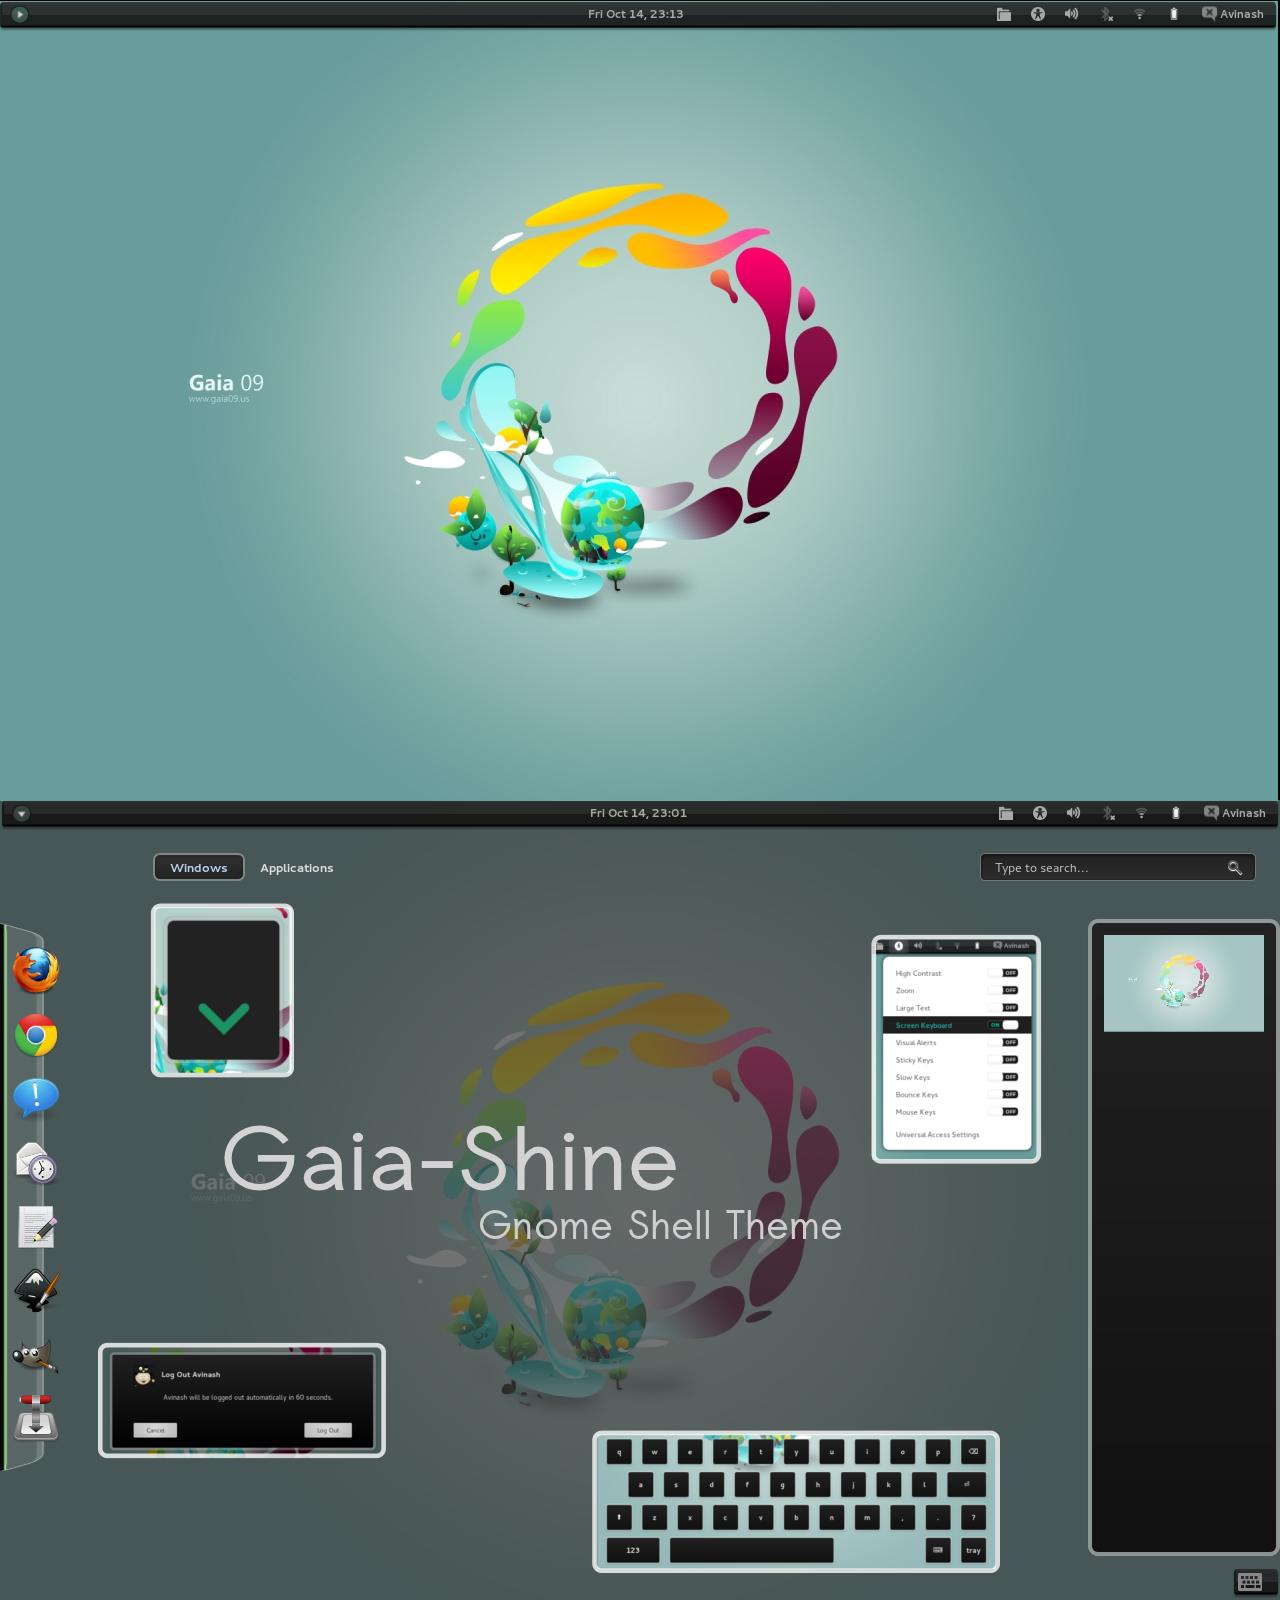 Gaia-shine shell theme by justviper